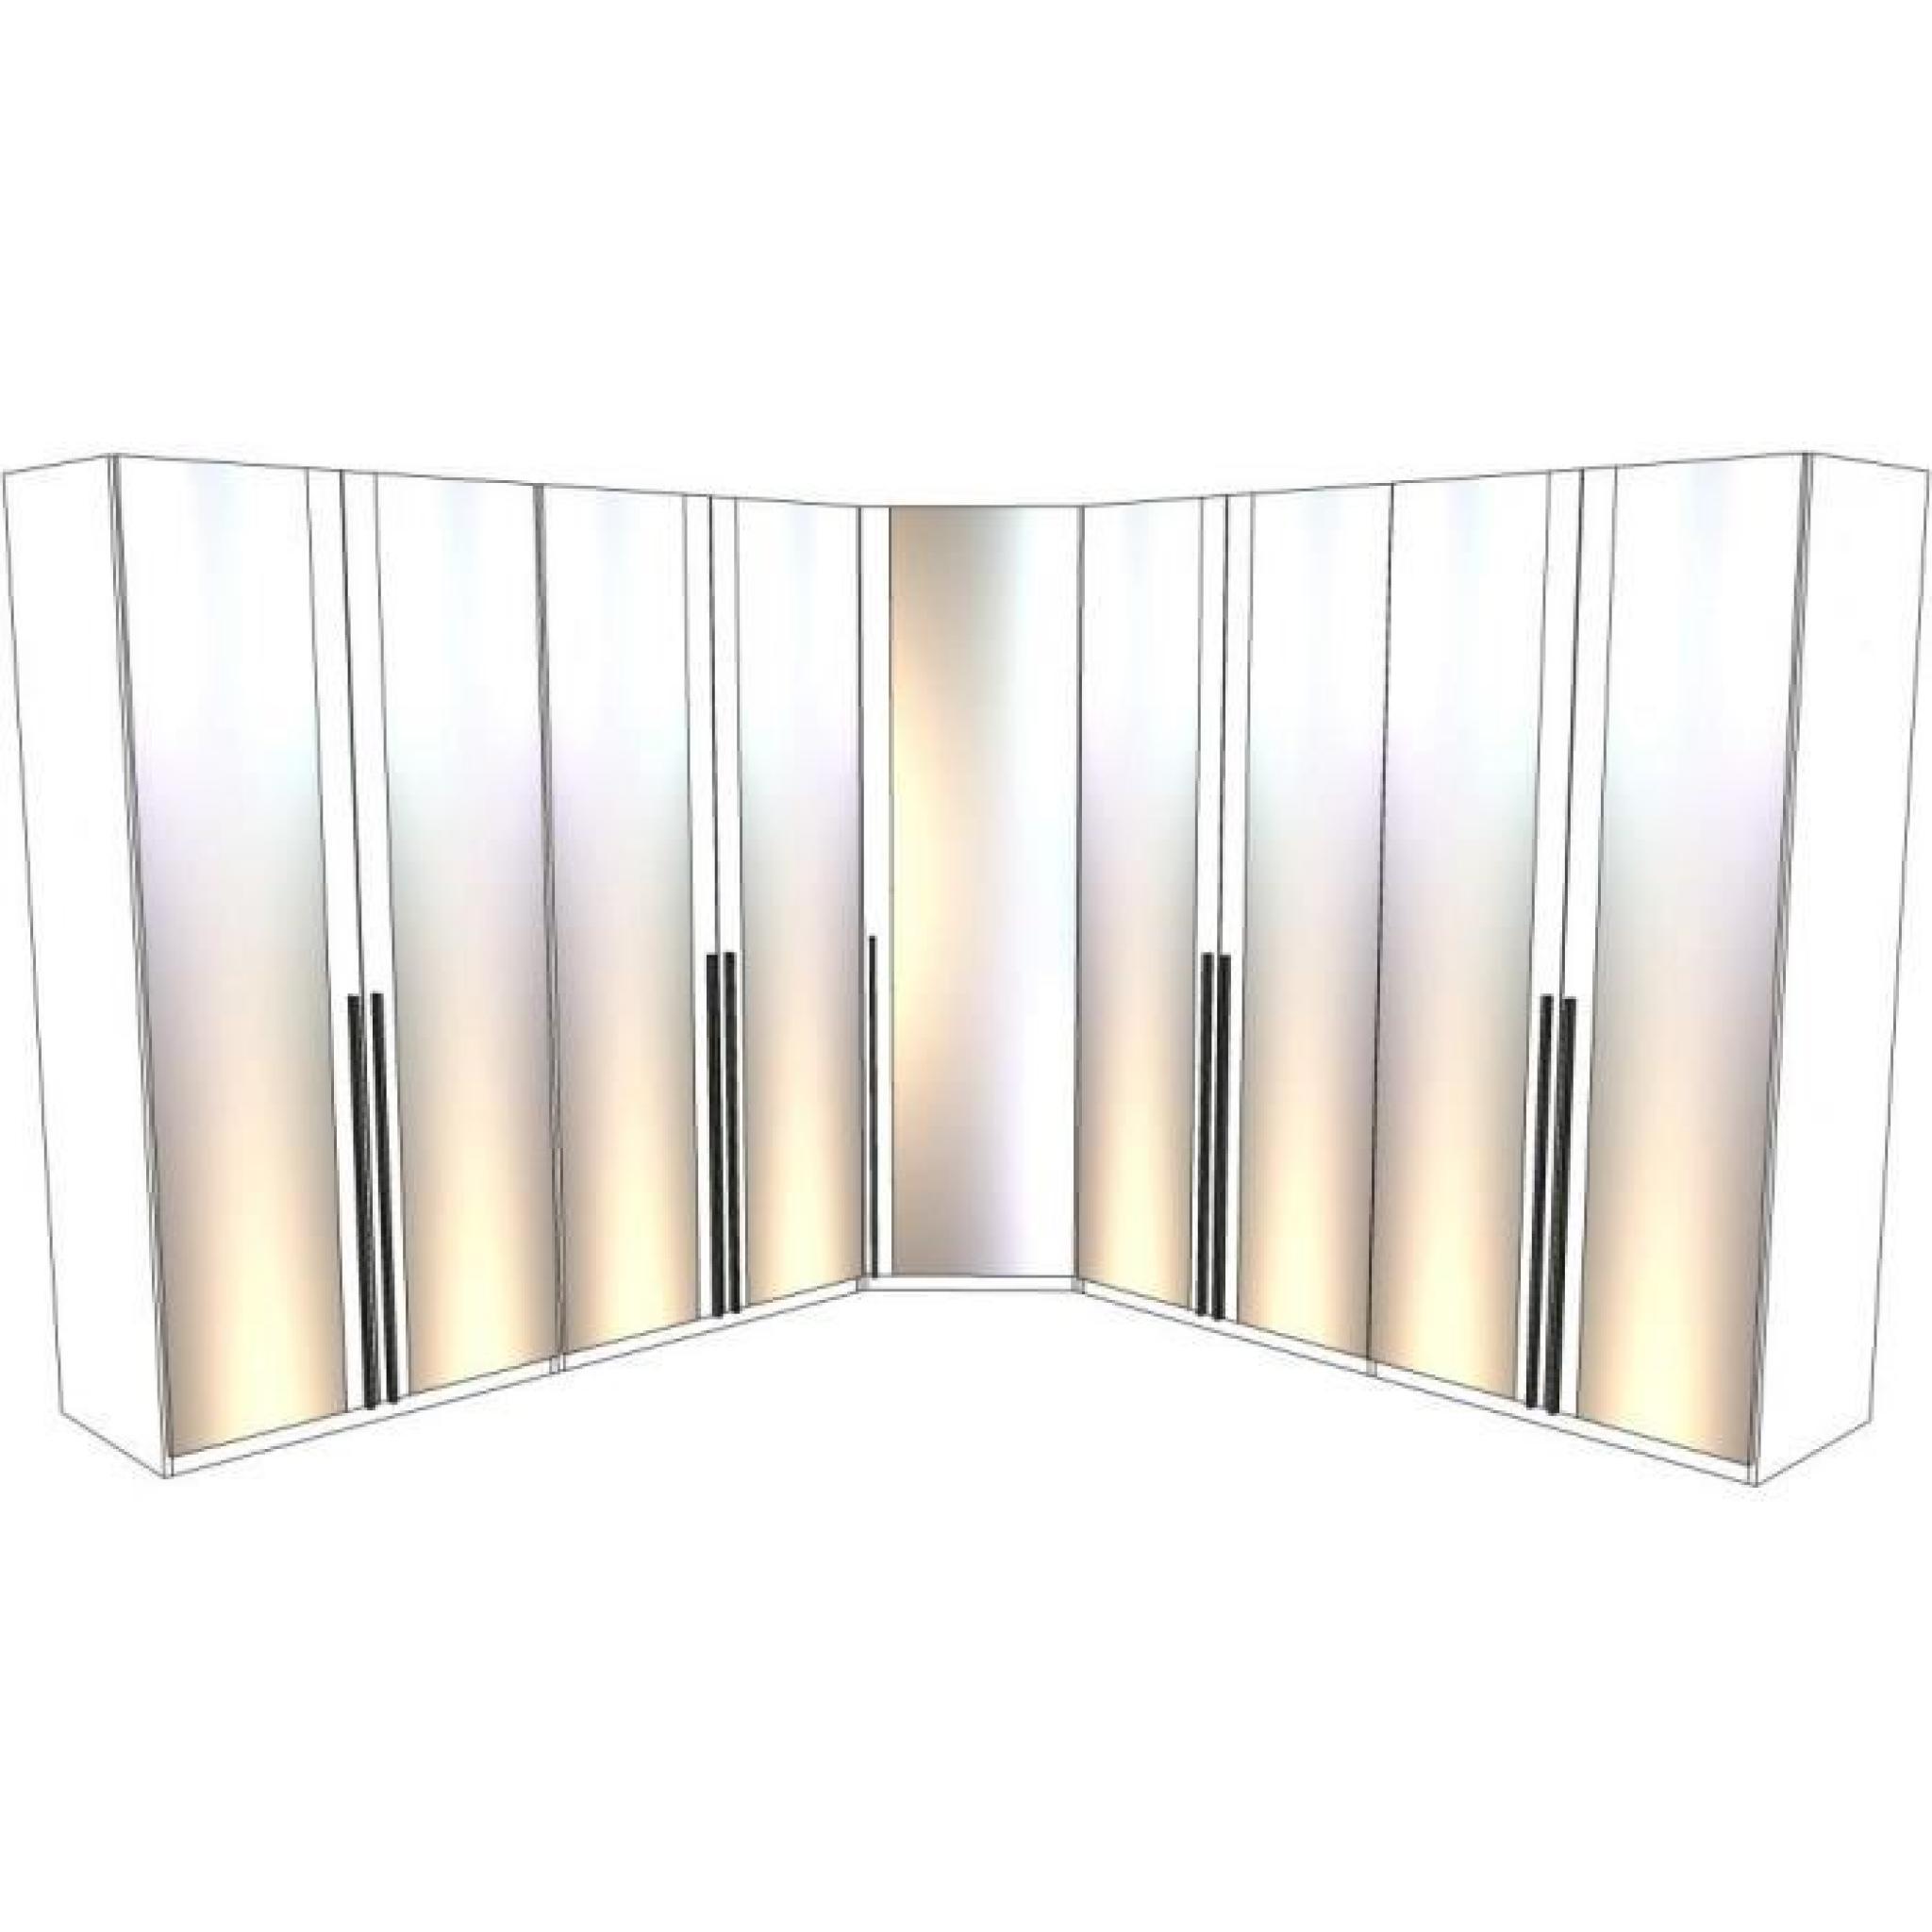 dressing d 39 angle solano l297 x l297 x h240 bois achat. Black Bedroom Furniture Sets. Home Design Ideas